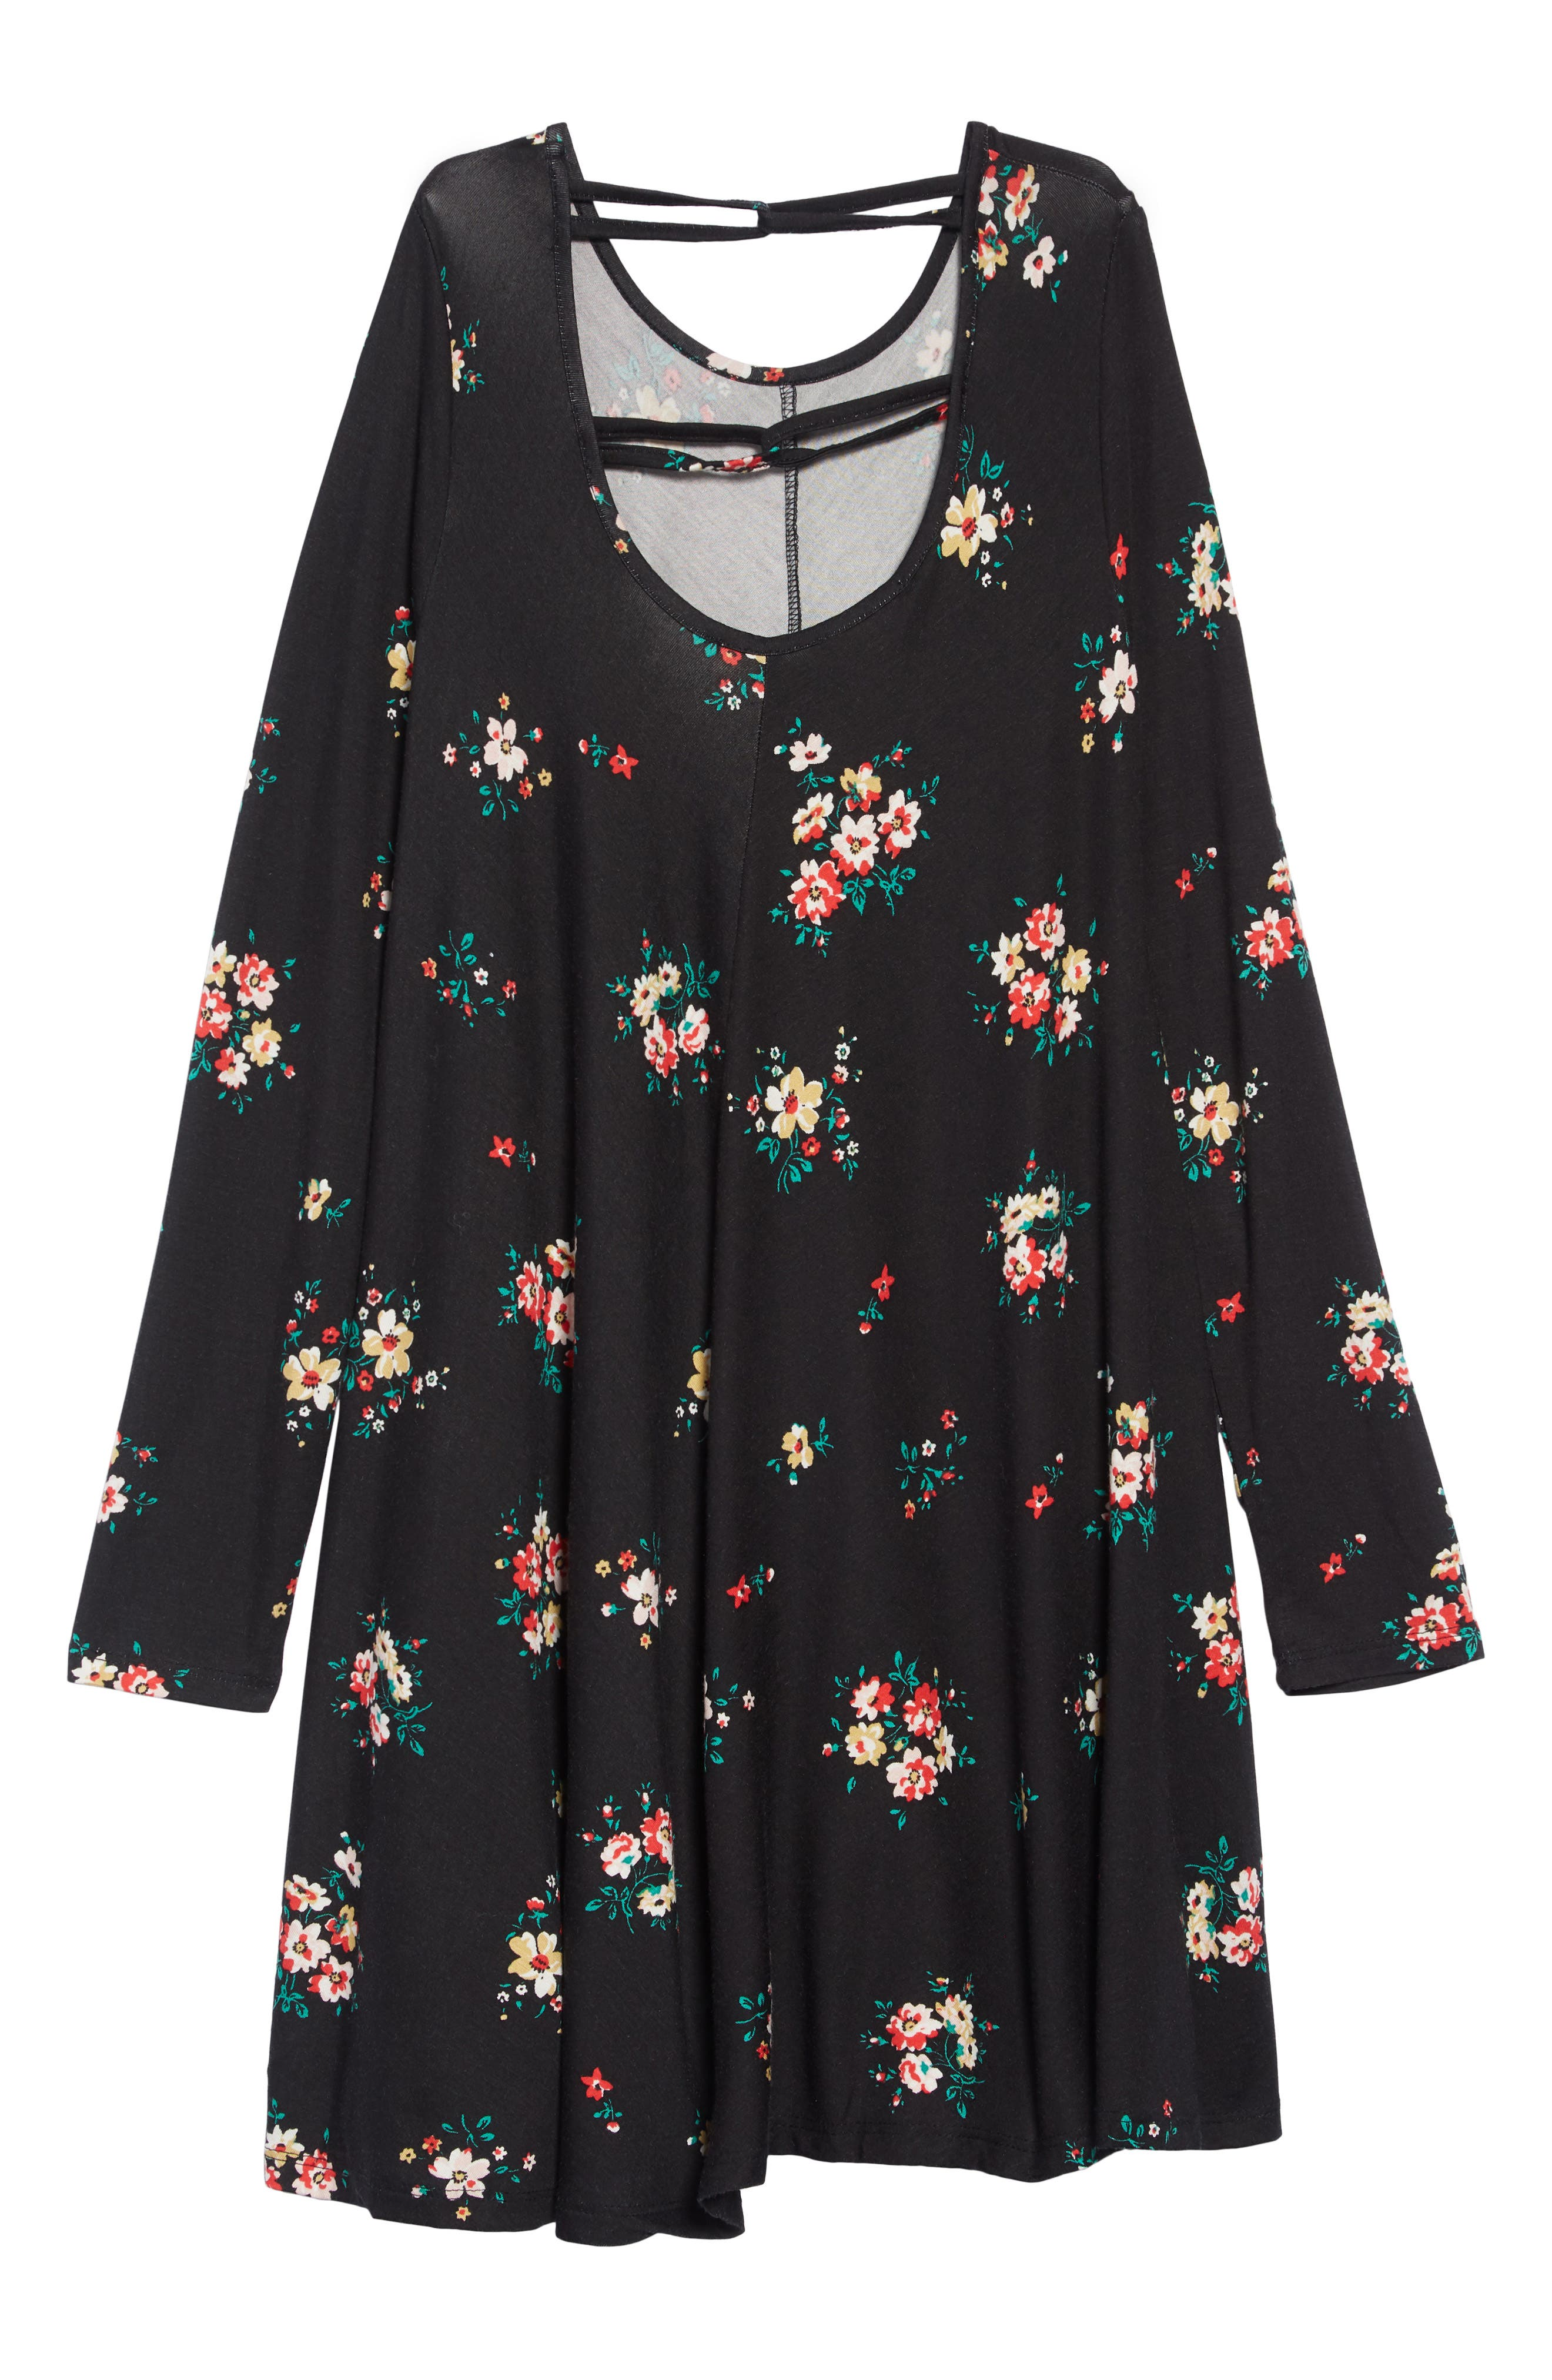 Printed Crisscross Back Shift Dress,                             Alternate thumbnail 2, color,                             BLACK PRETTY FLORAL